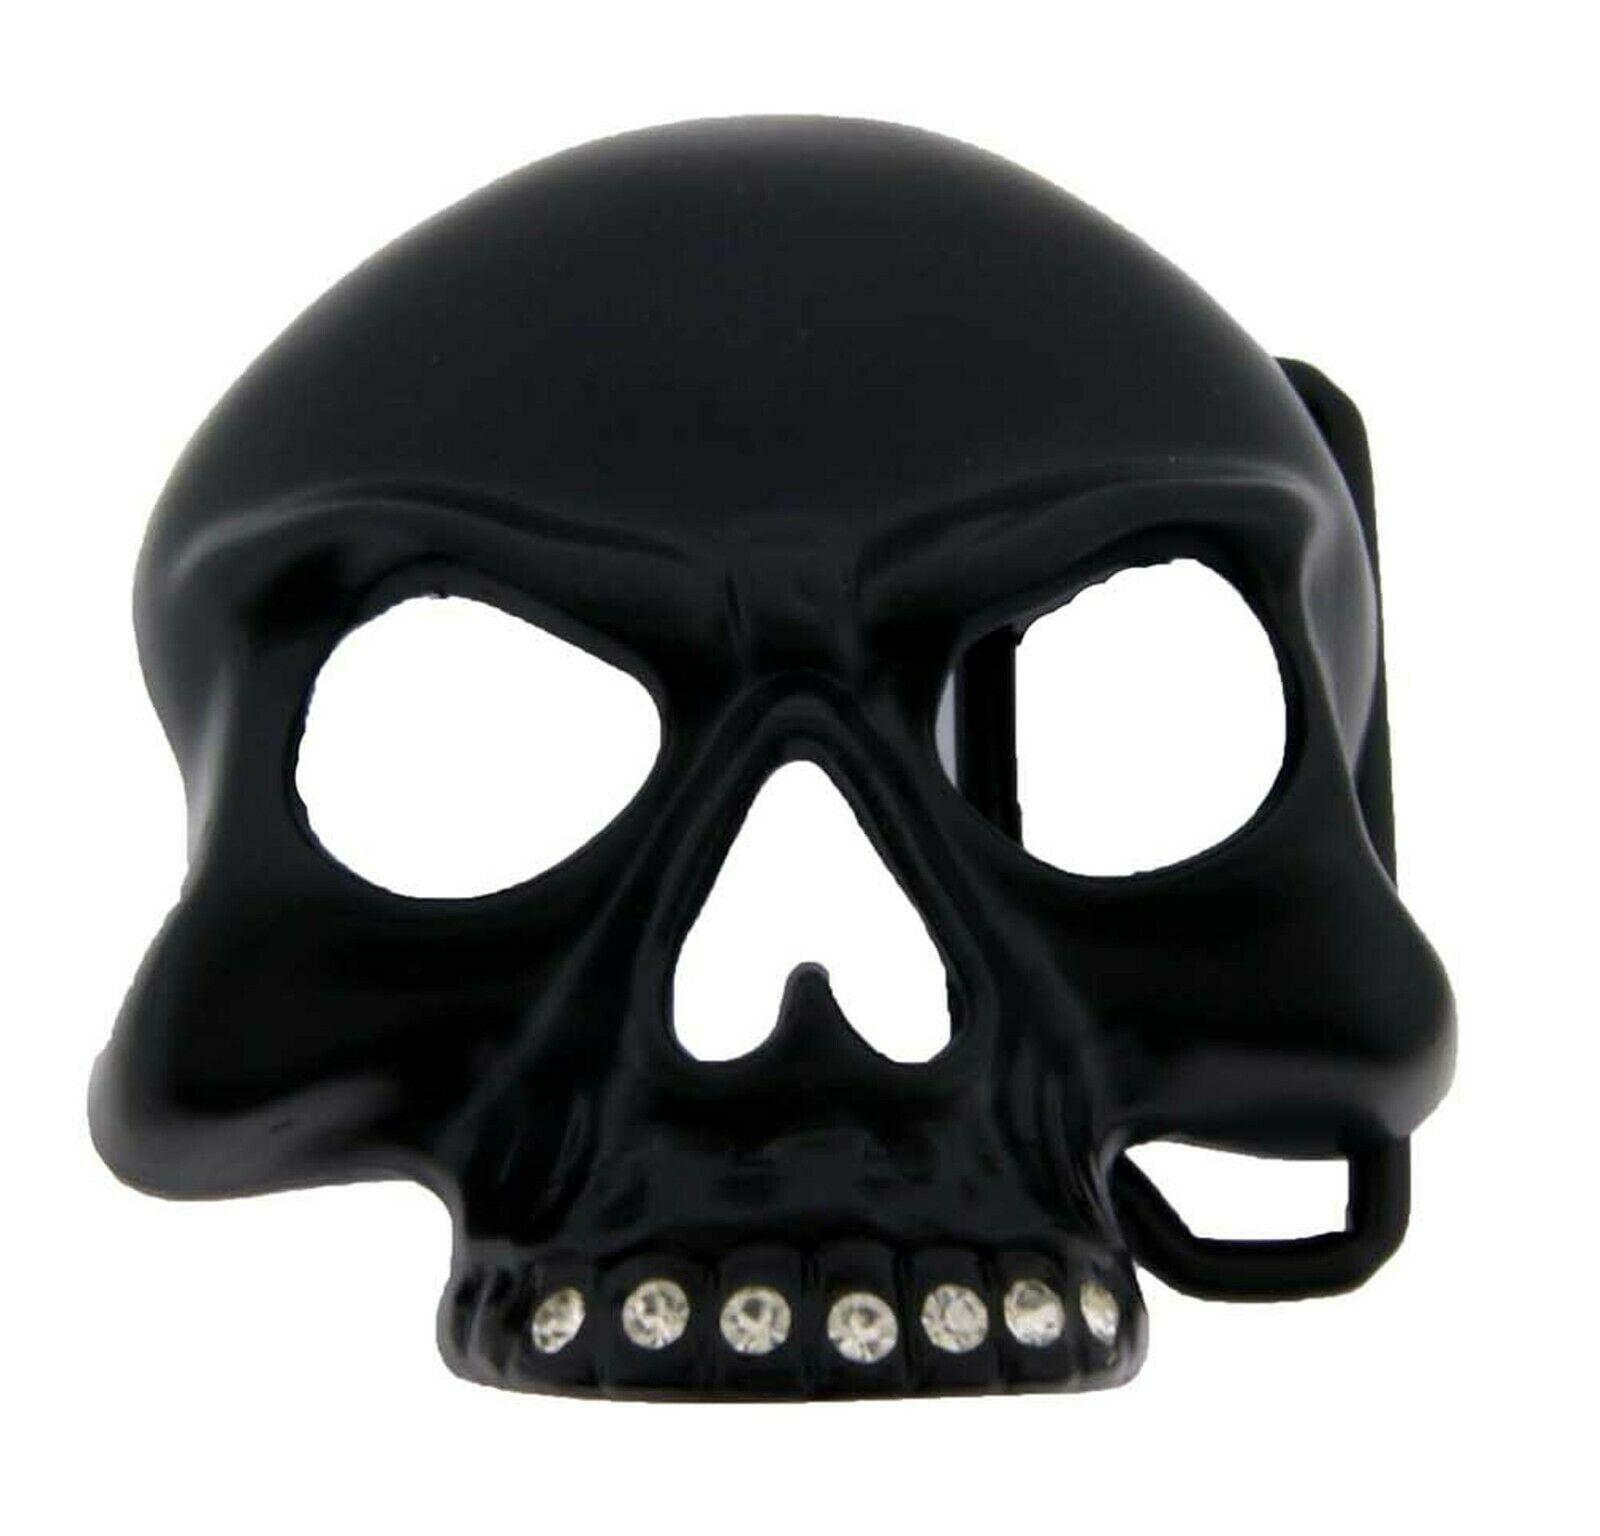 Details about  /BRAND NEW DINOSAUR FOSSIL HEAD SKULL  BELT BUCKLE